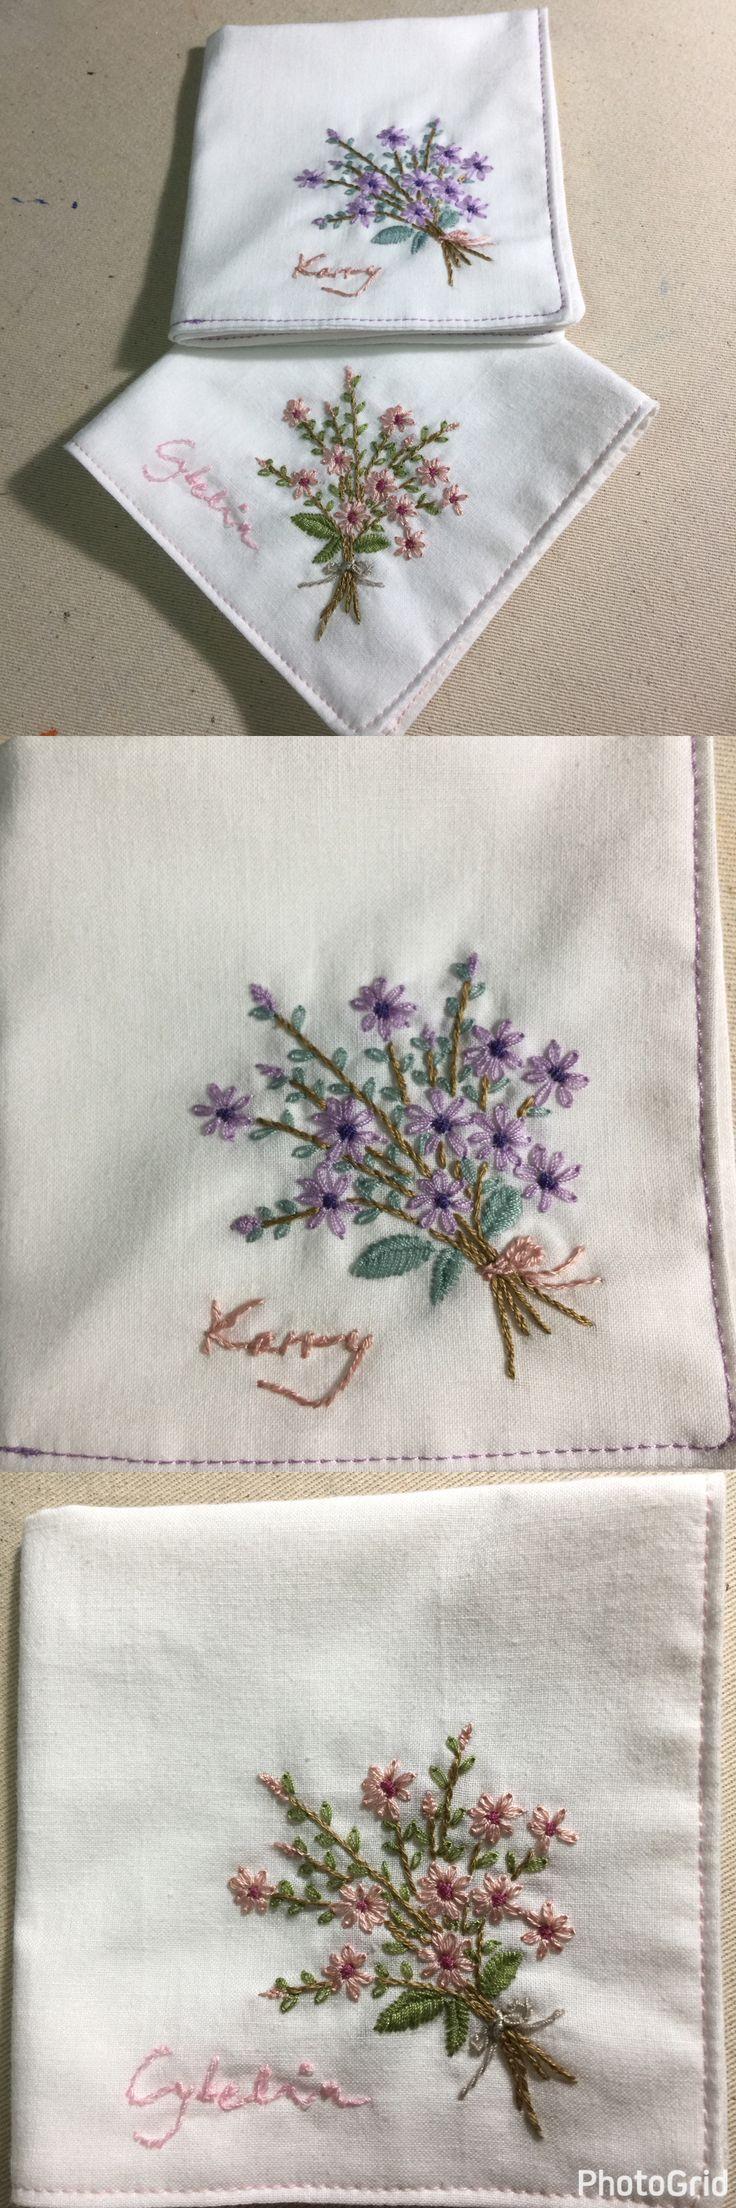 Handmade handkerchief